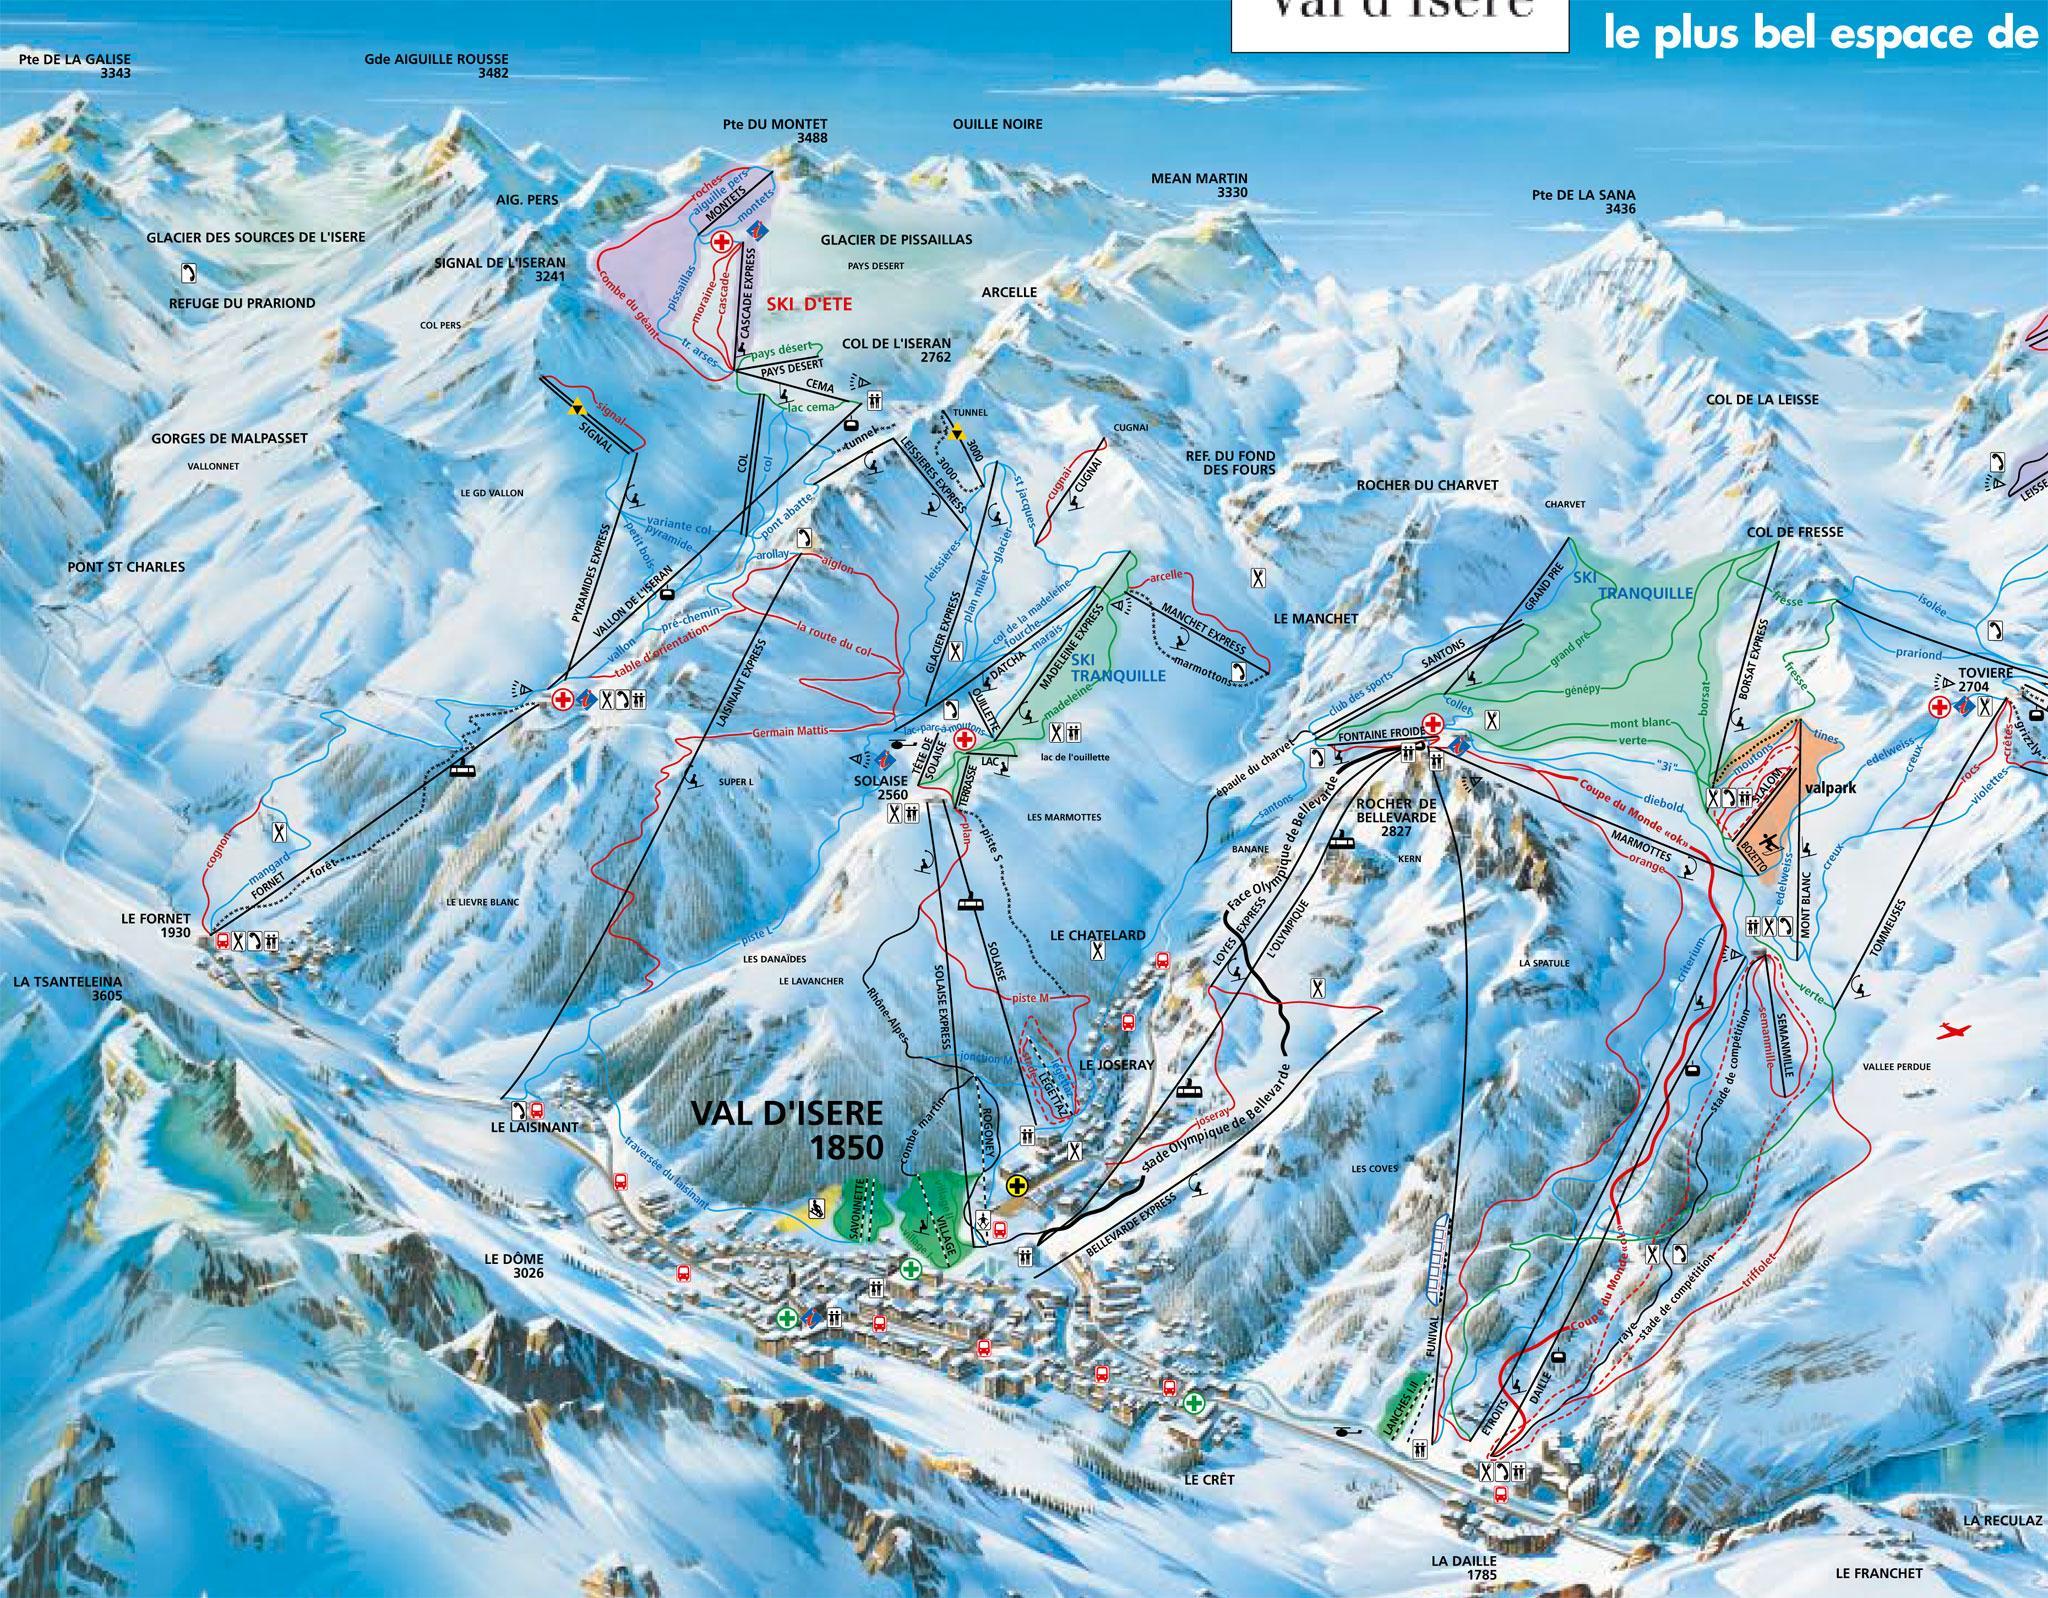 Val D Isere Ski Map Val d'Isère Piste Map | J2Ski Val D Isere Ski Map